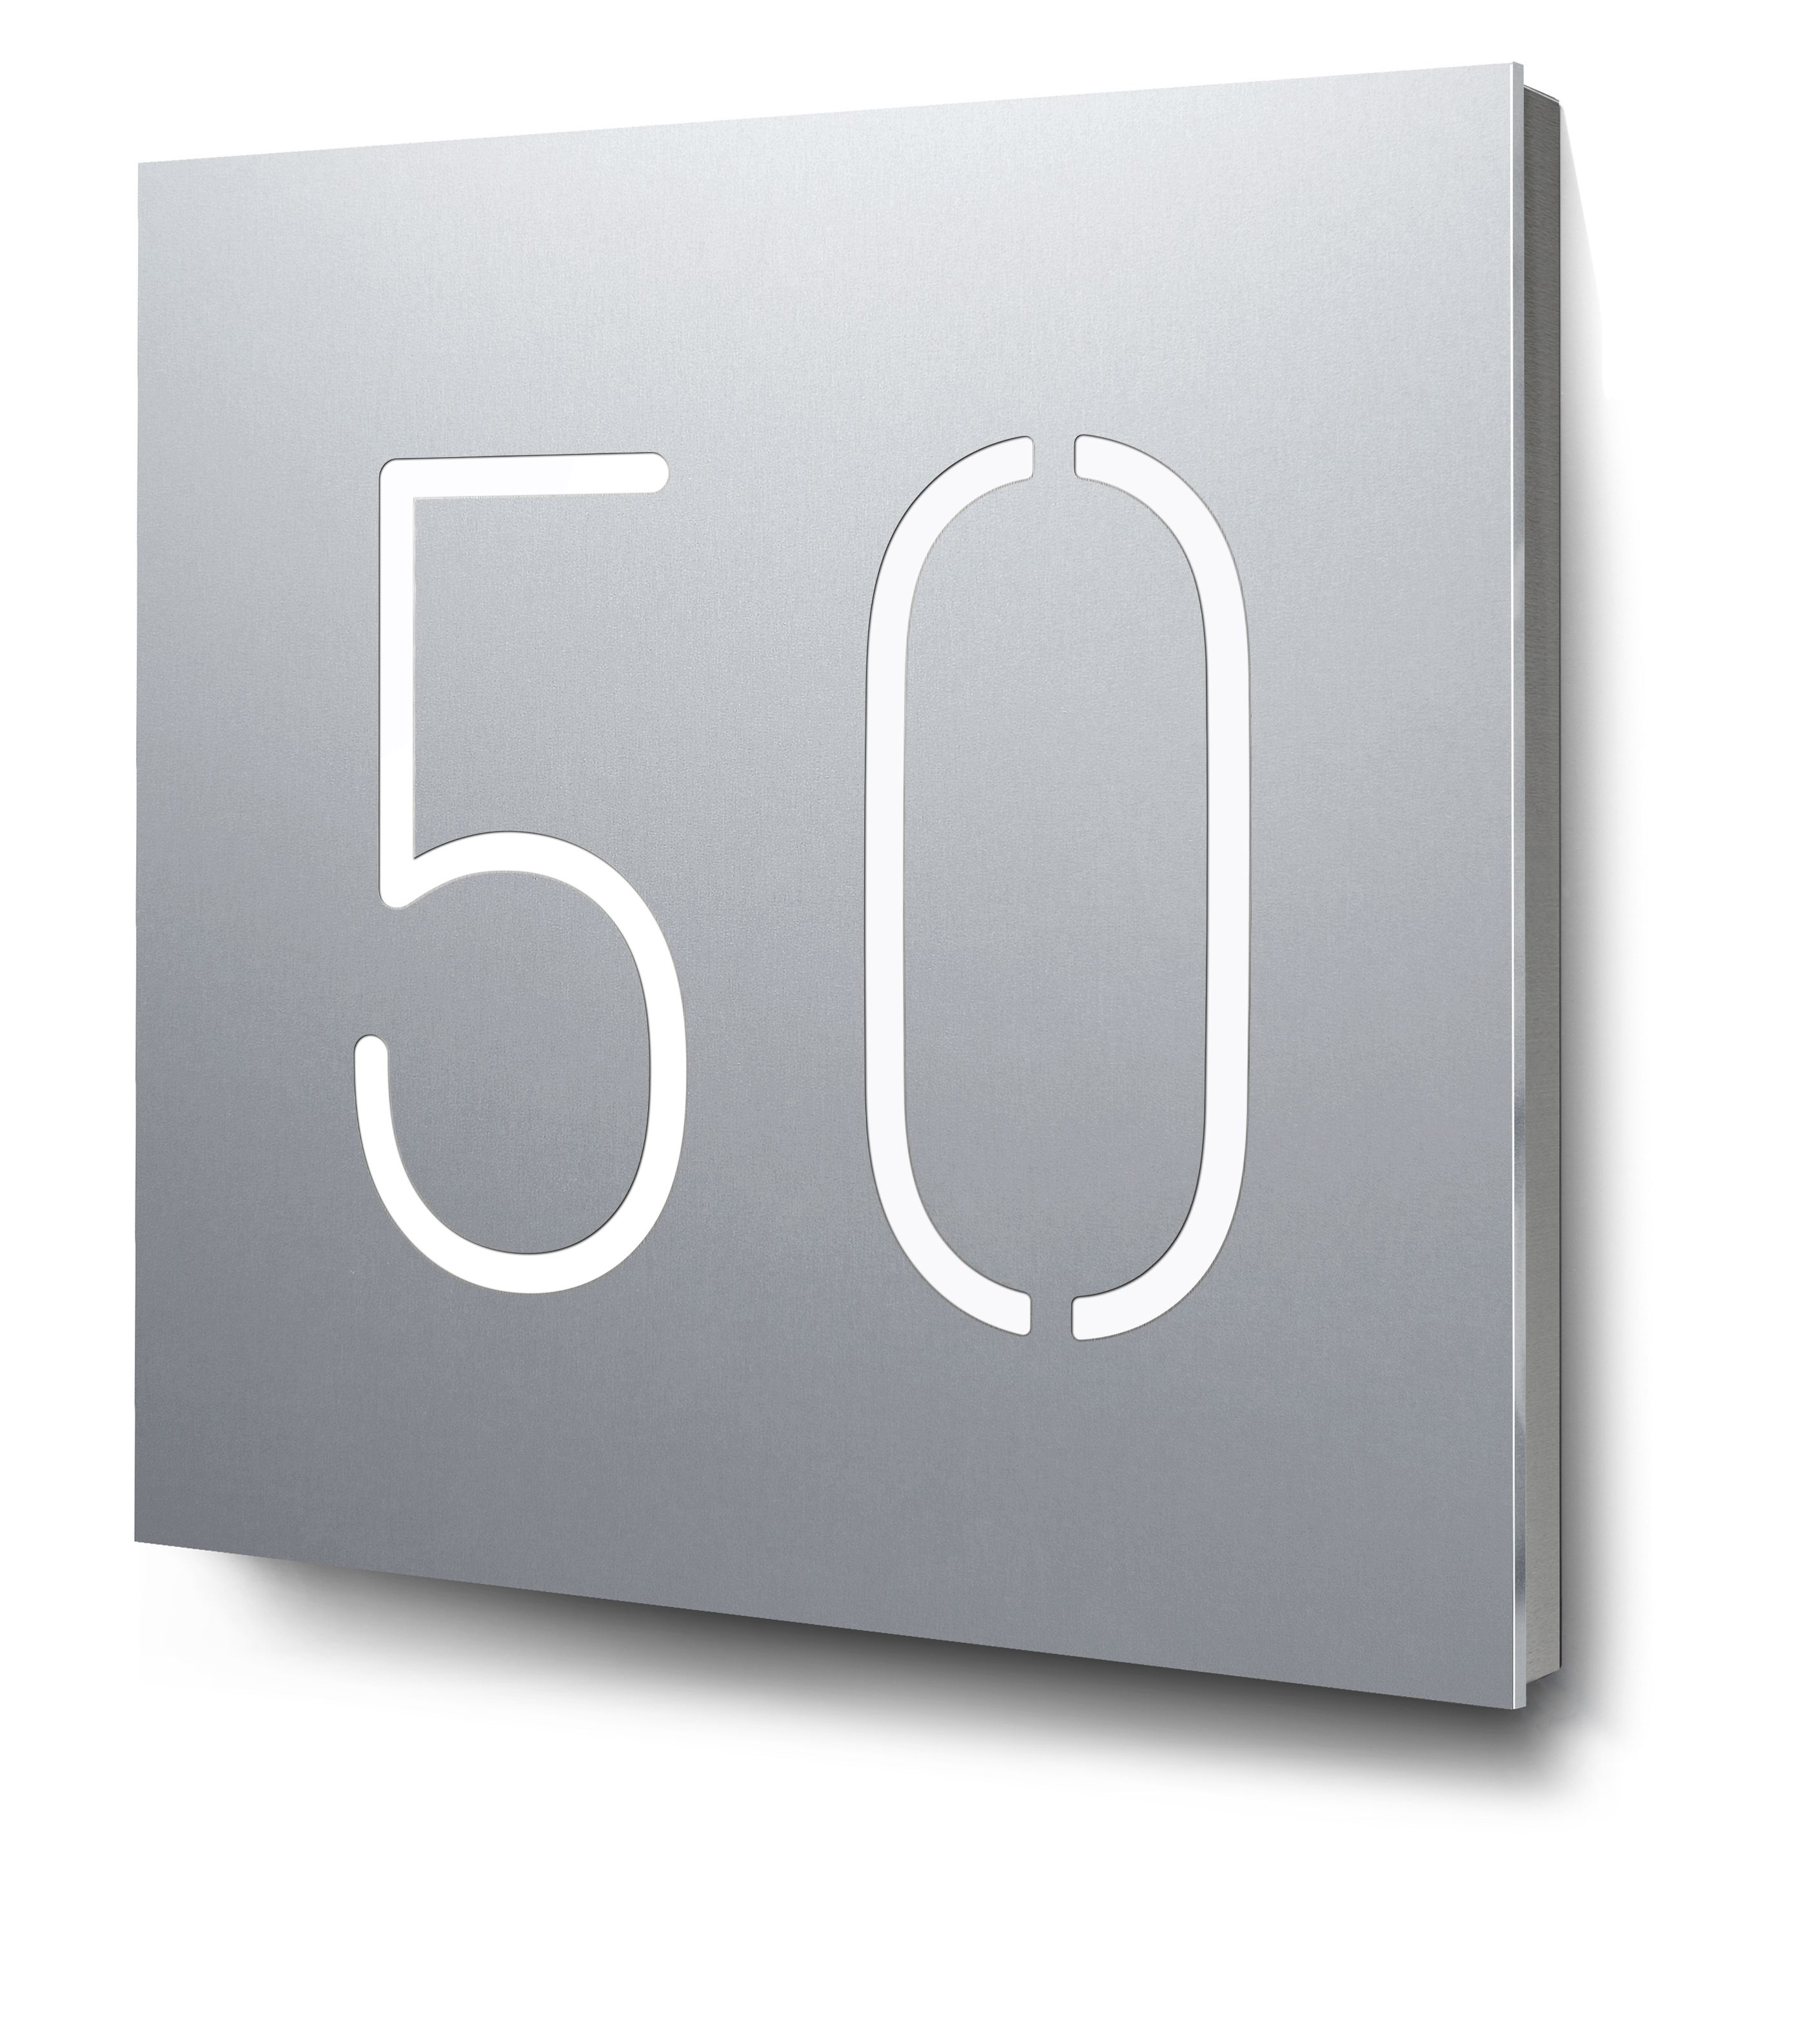 Hausnummer aus Edelstahl  V2A Hausnummern VA Hausnummernschild